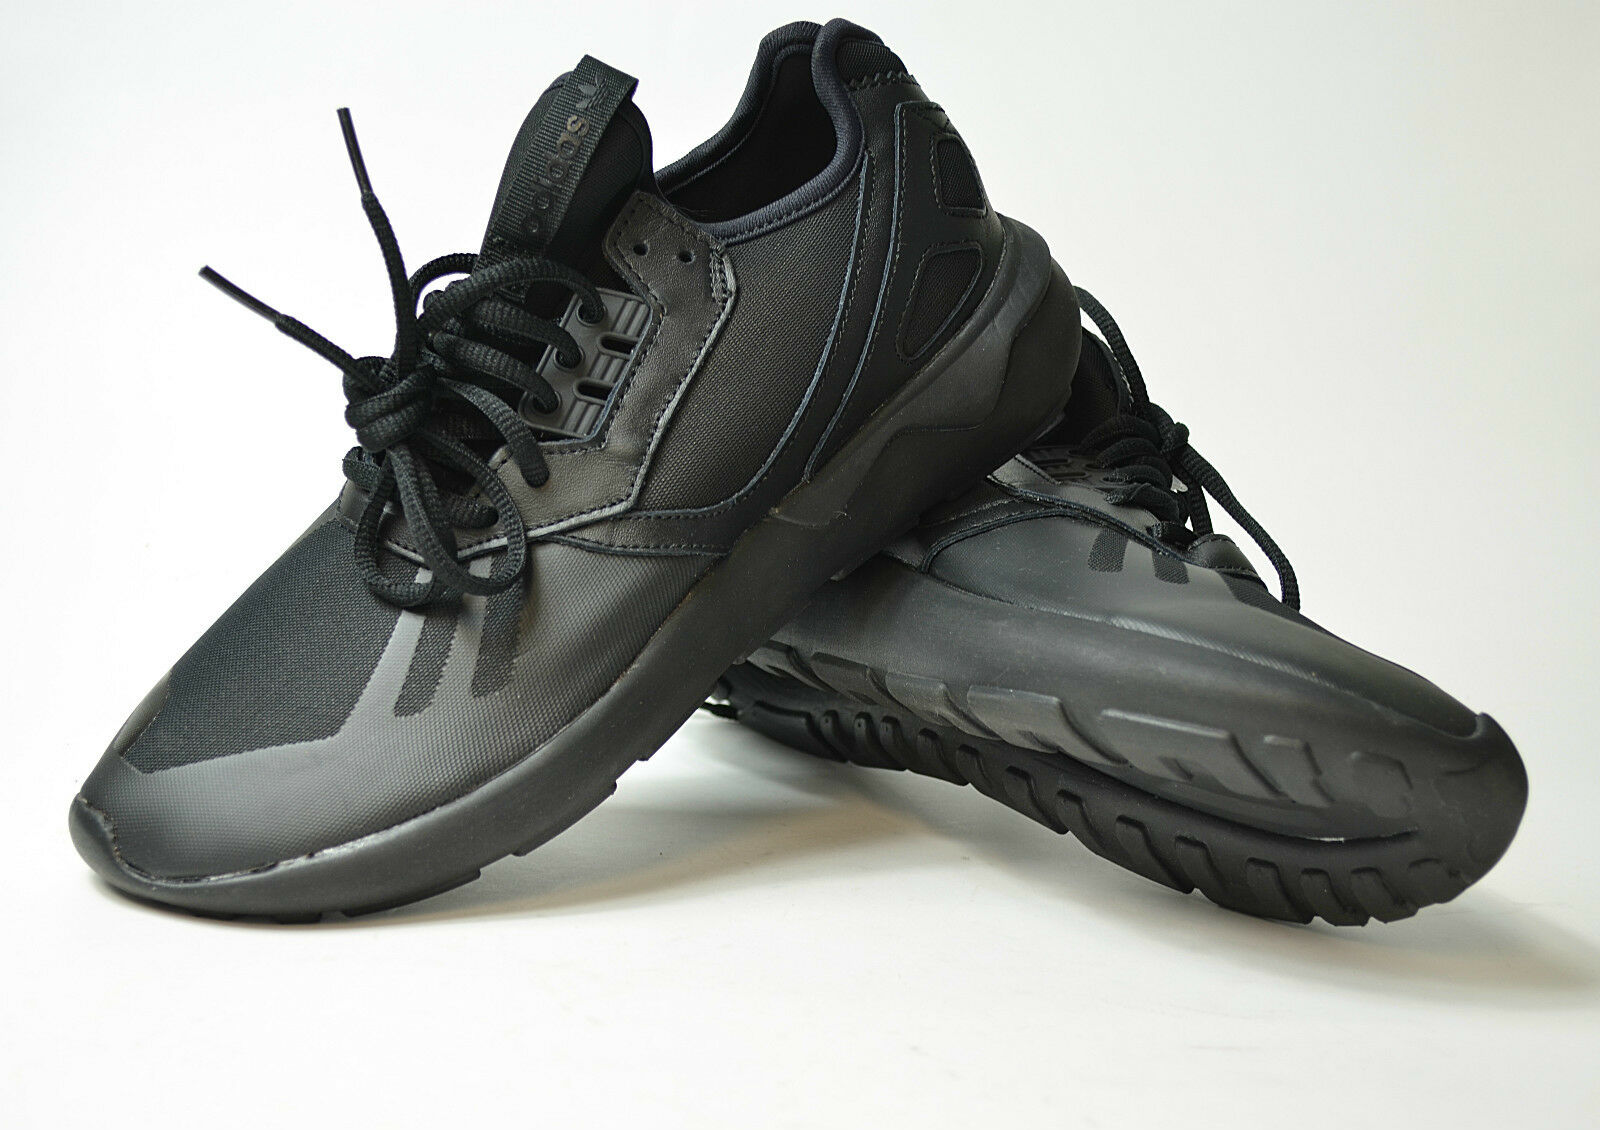 ADIDAS Tubular Runner B25089 Scarpe da Damen Ginnastica Gr. 40 2/3 Damen da Schuhe (R5) NEU 6eefea